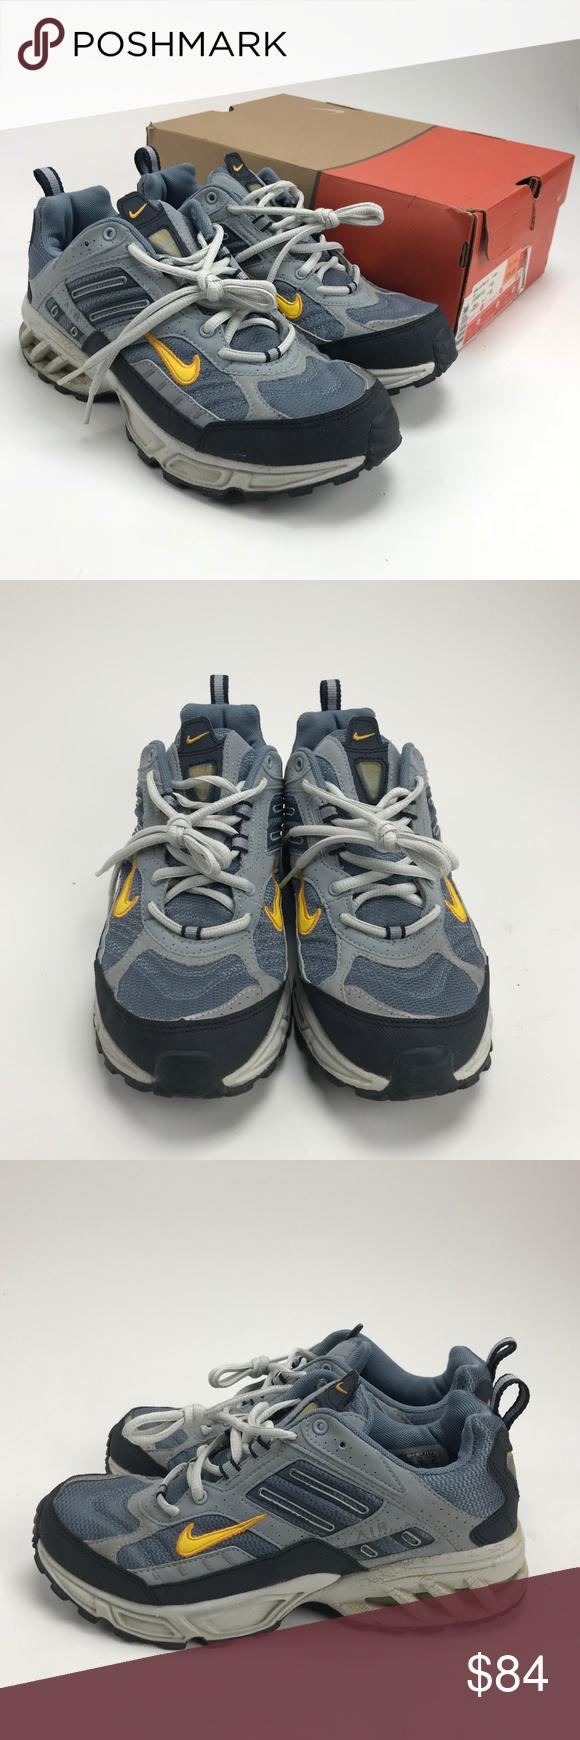 best service f2827 11e3d VTG Nike Air Max Assail Grey Running Womens Sz 10 Nike Air Max Assail Grey  Running